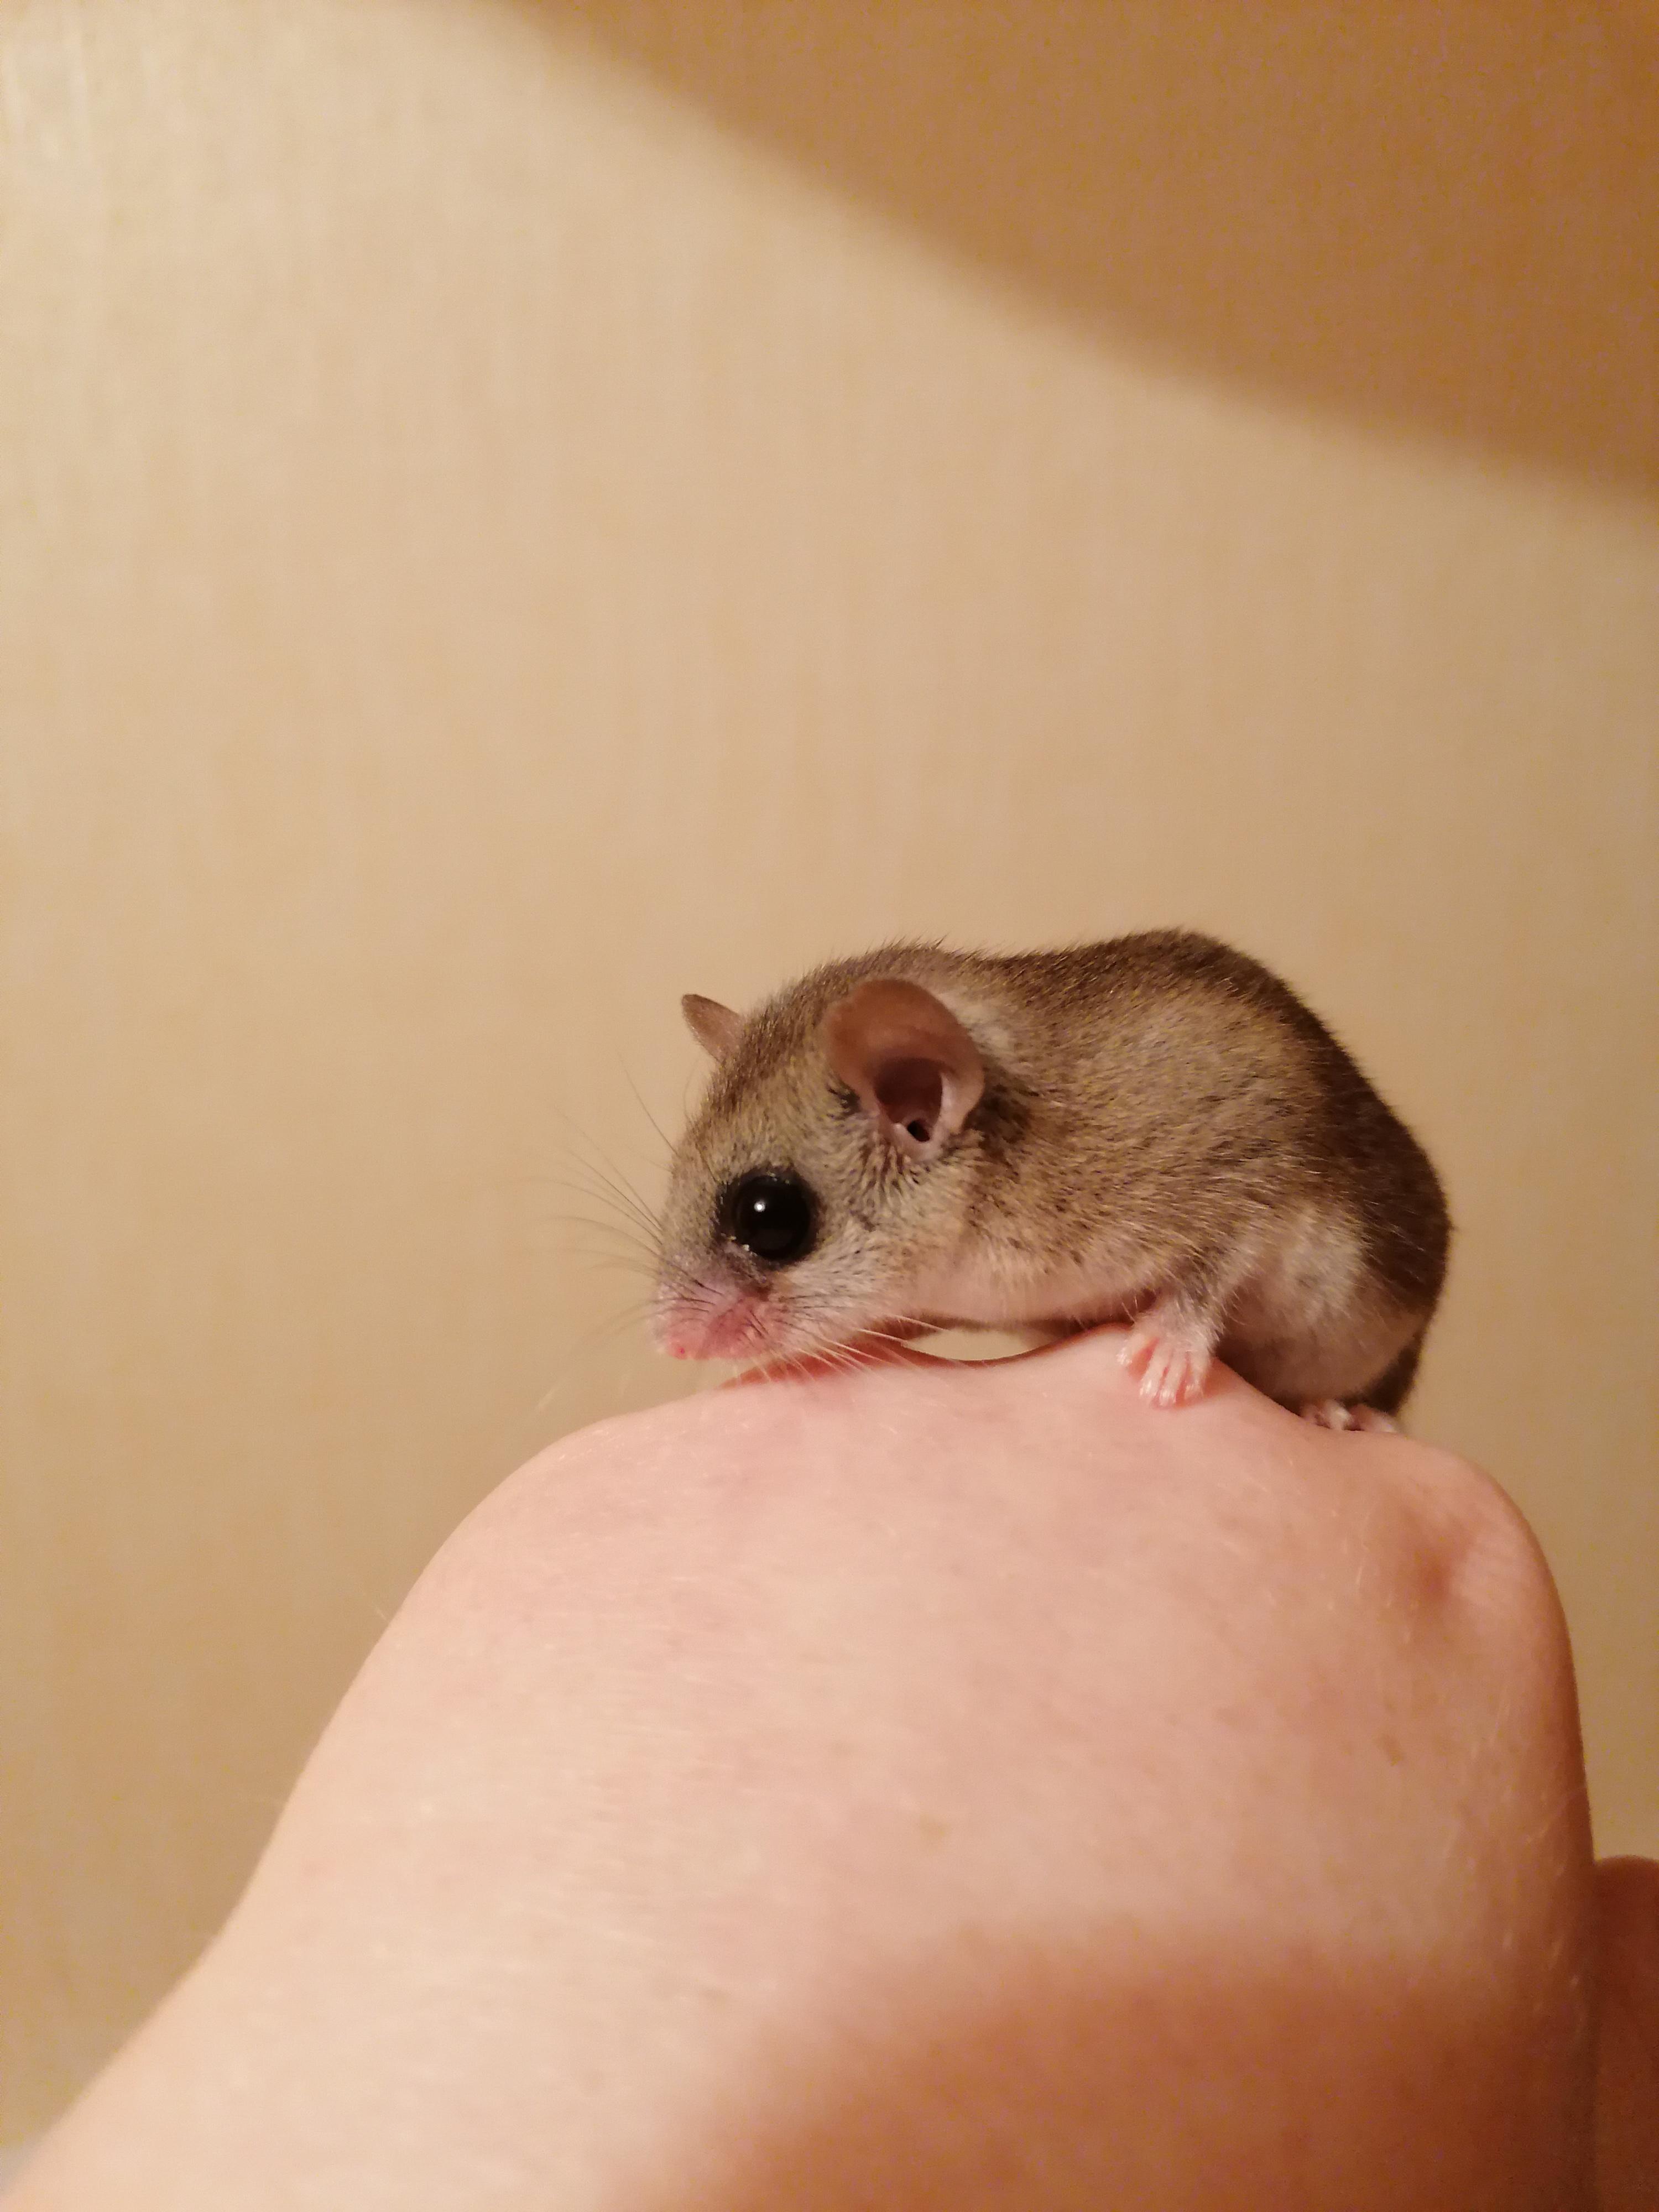 Sexing micro squirrel-img_20200816_235947_1597659729426.jpg